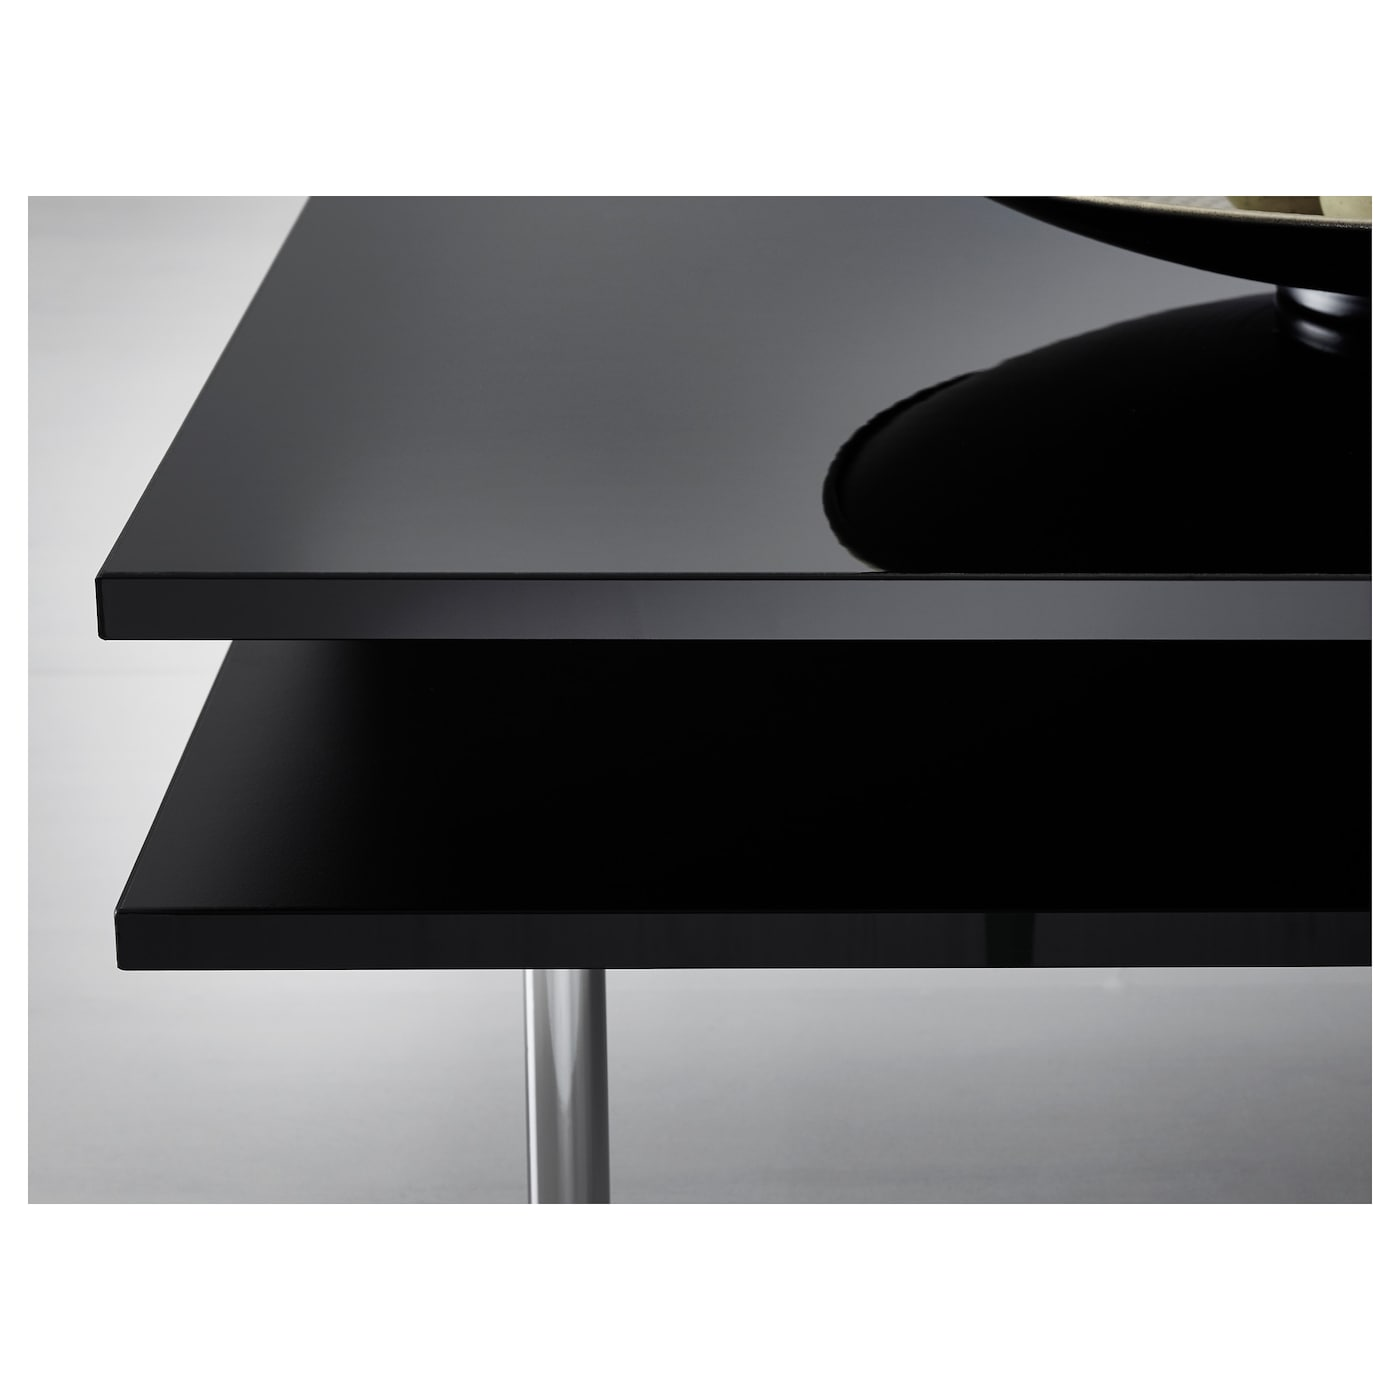 tofteryd coffee table high-gloss black 95x95 cm - ikea